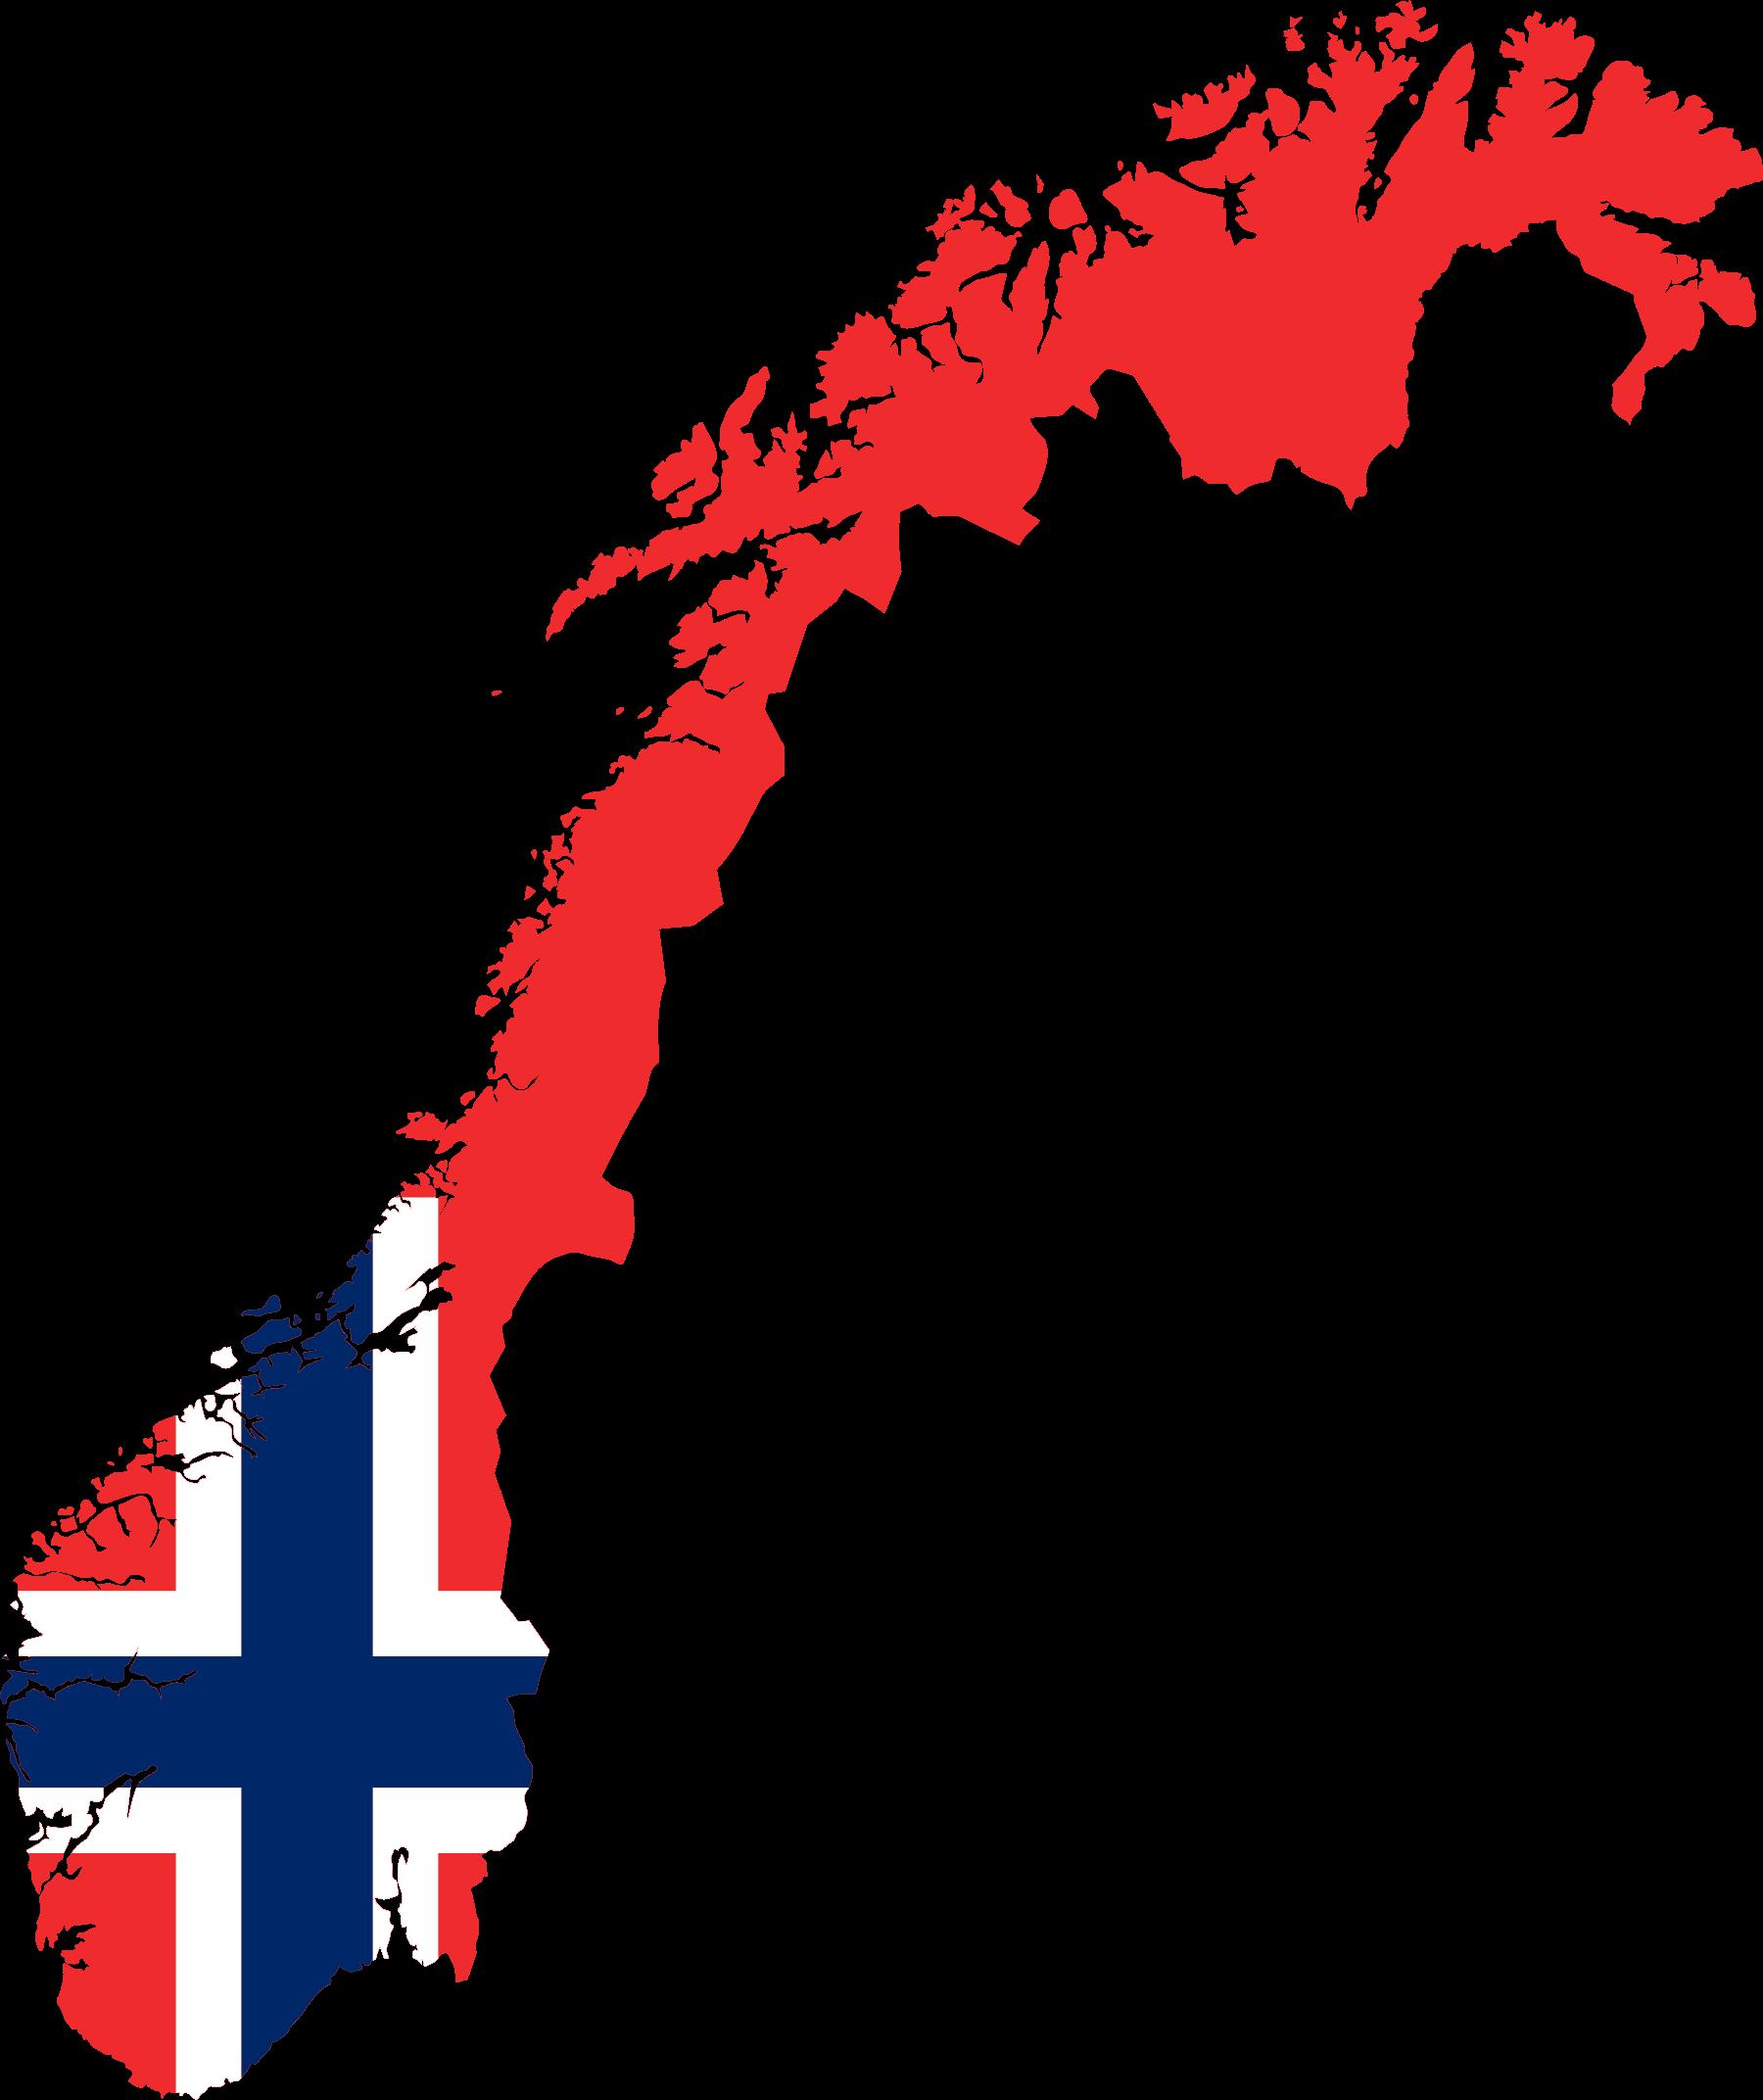 norway map. norway  map  flag  norway  pinterest  norway map